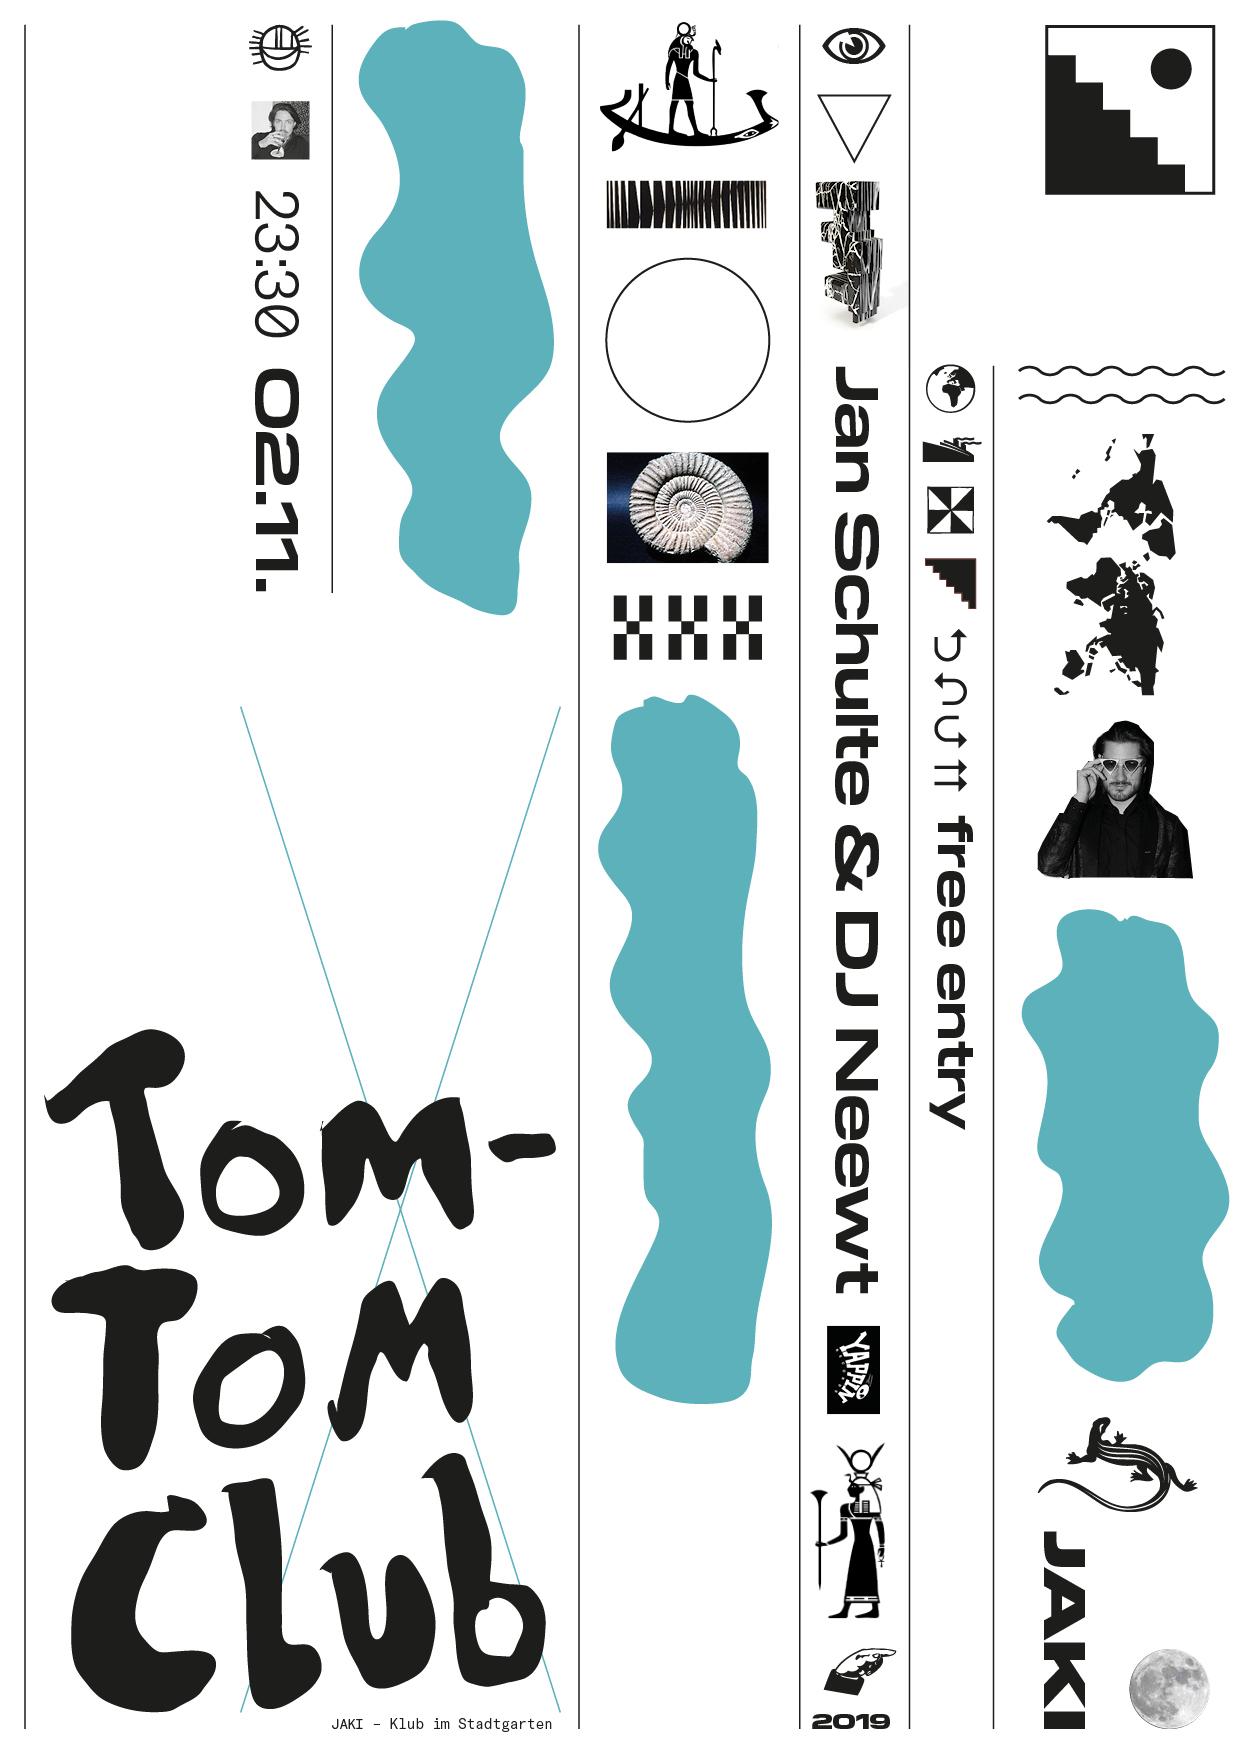 TomTom_1102